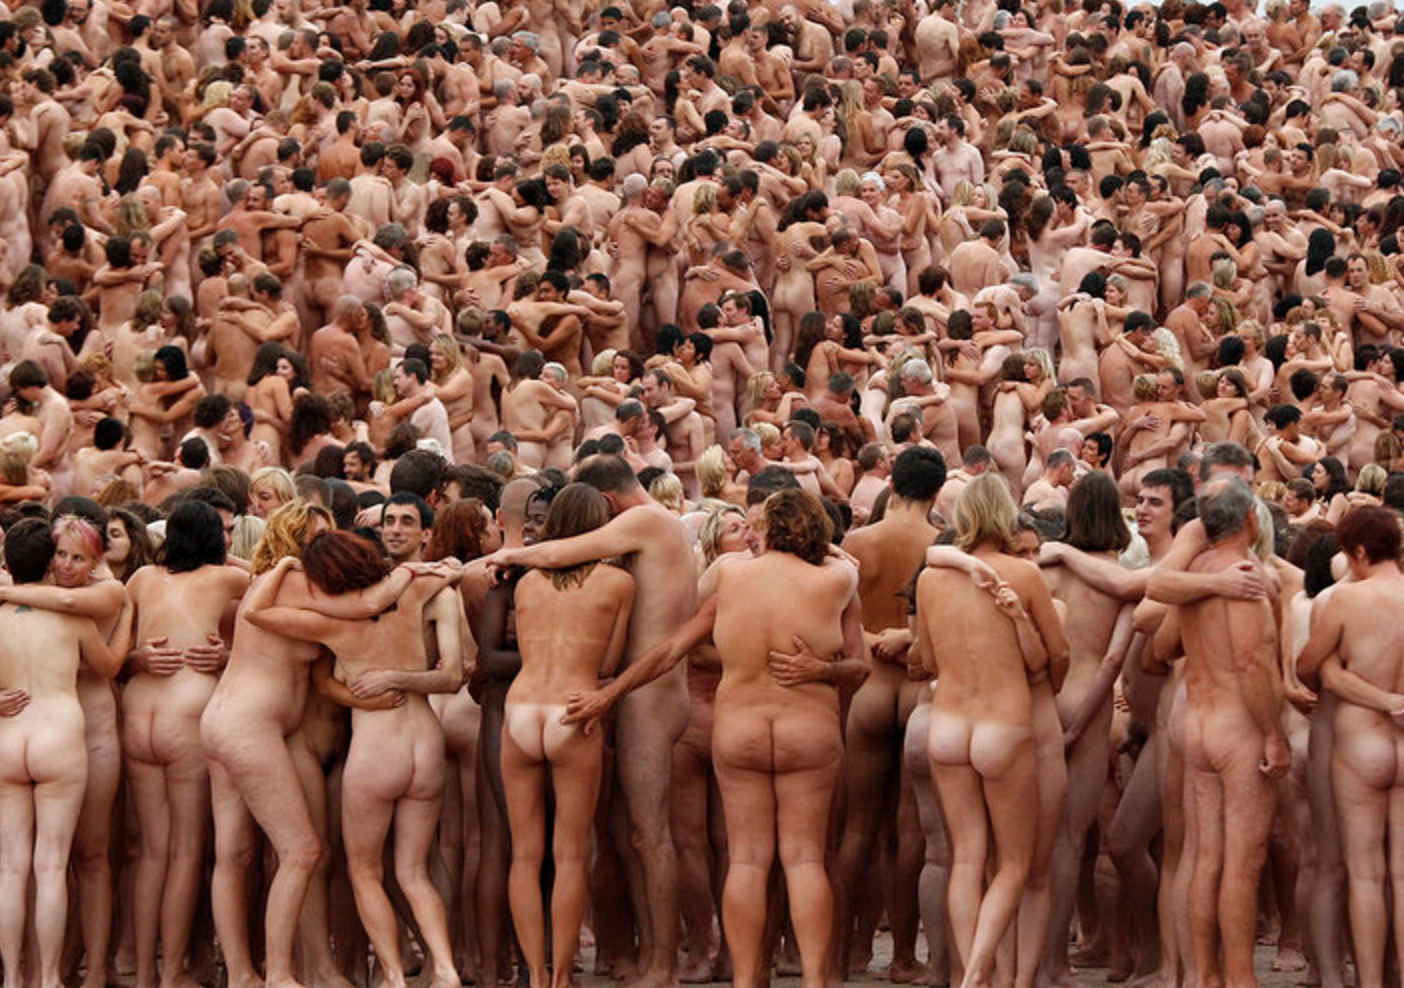 Unique nudes